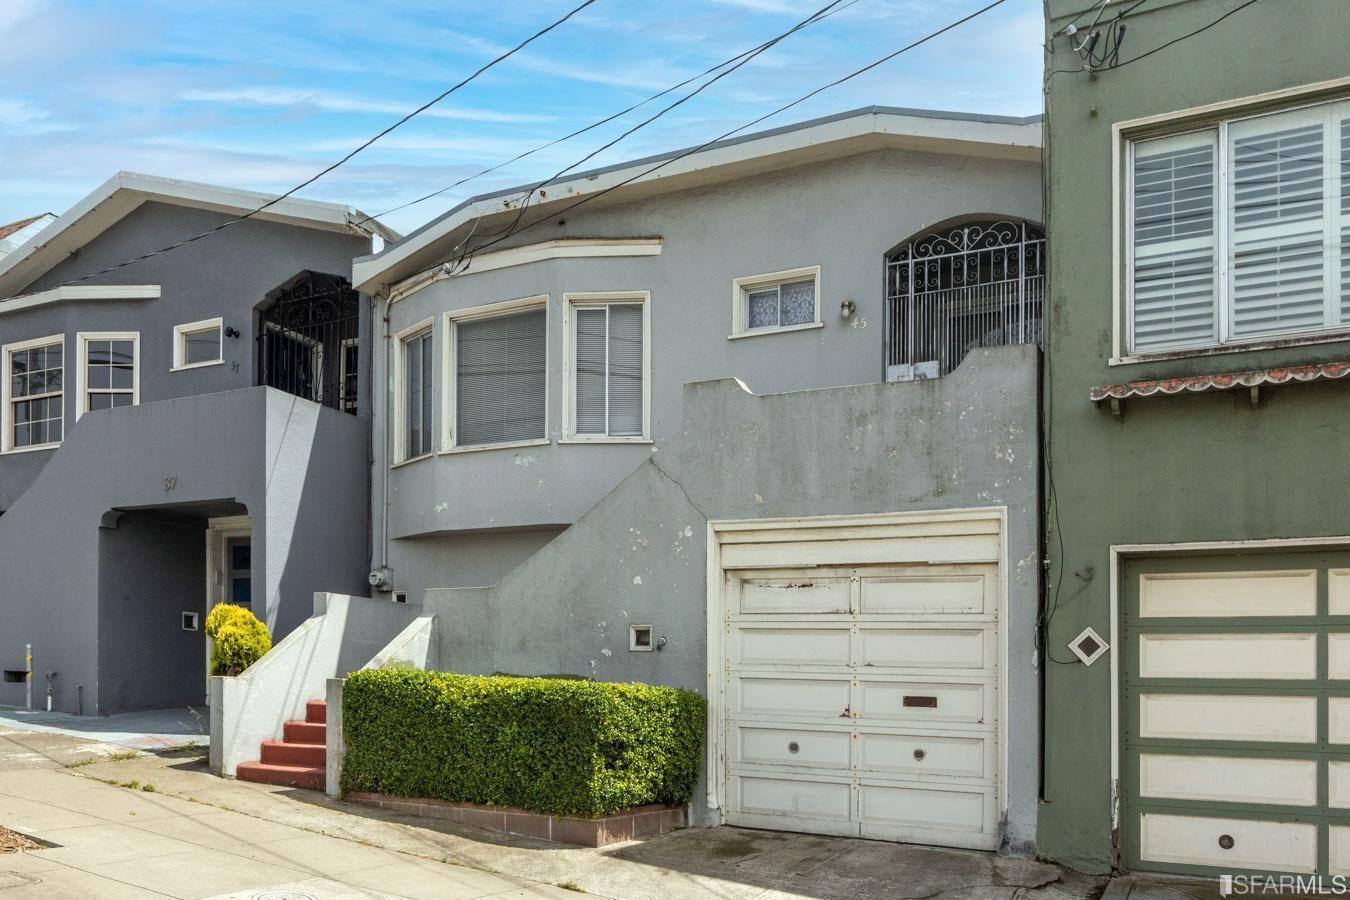 45 Grafton Avenue, San Francisco, CA 94112 - #: 421570950